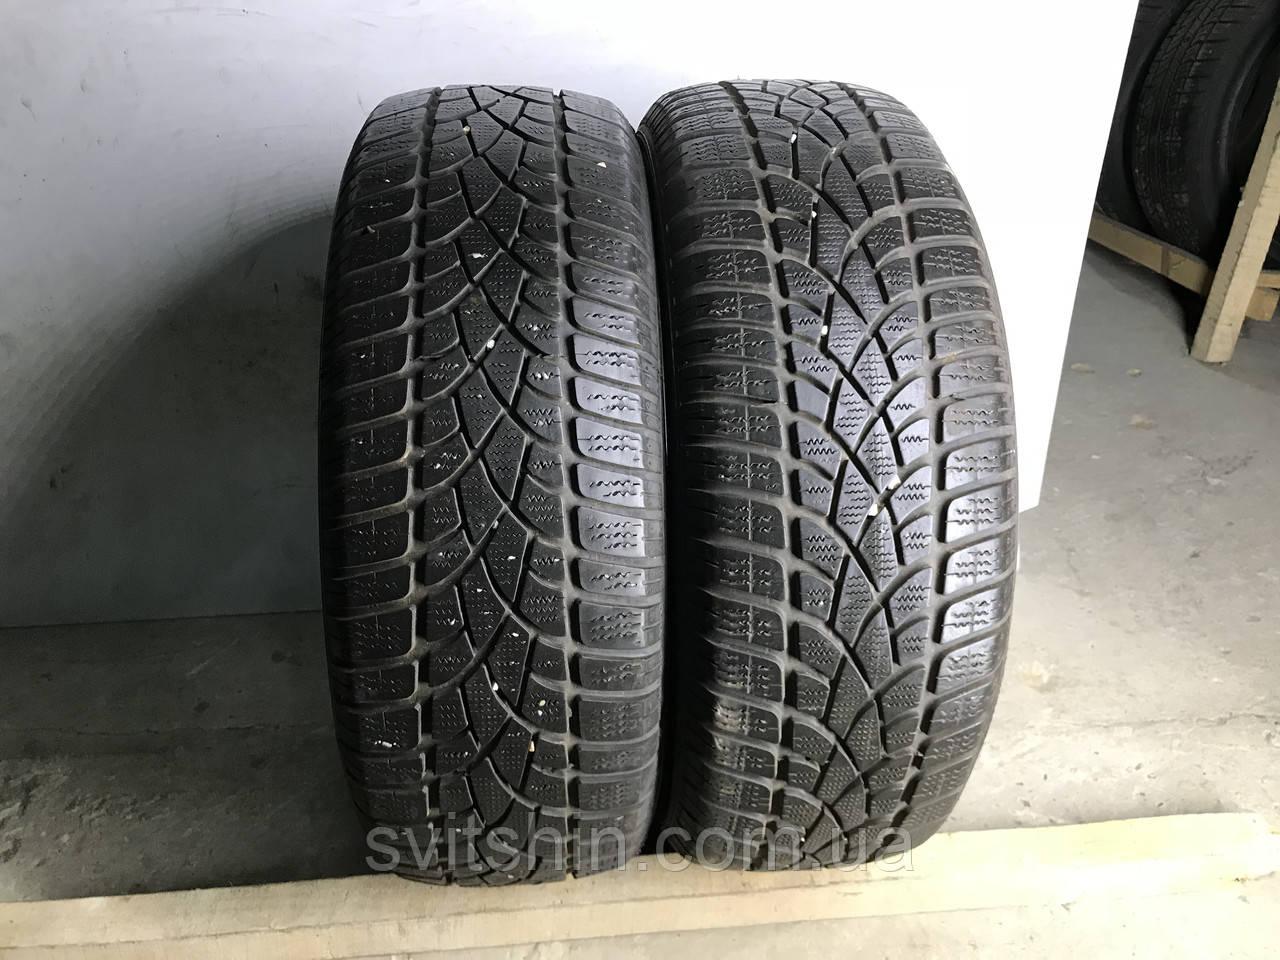 Шины бу зима 205/60R16 Dunlop SP Winter Sport 3D (2шт) 6мм